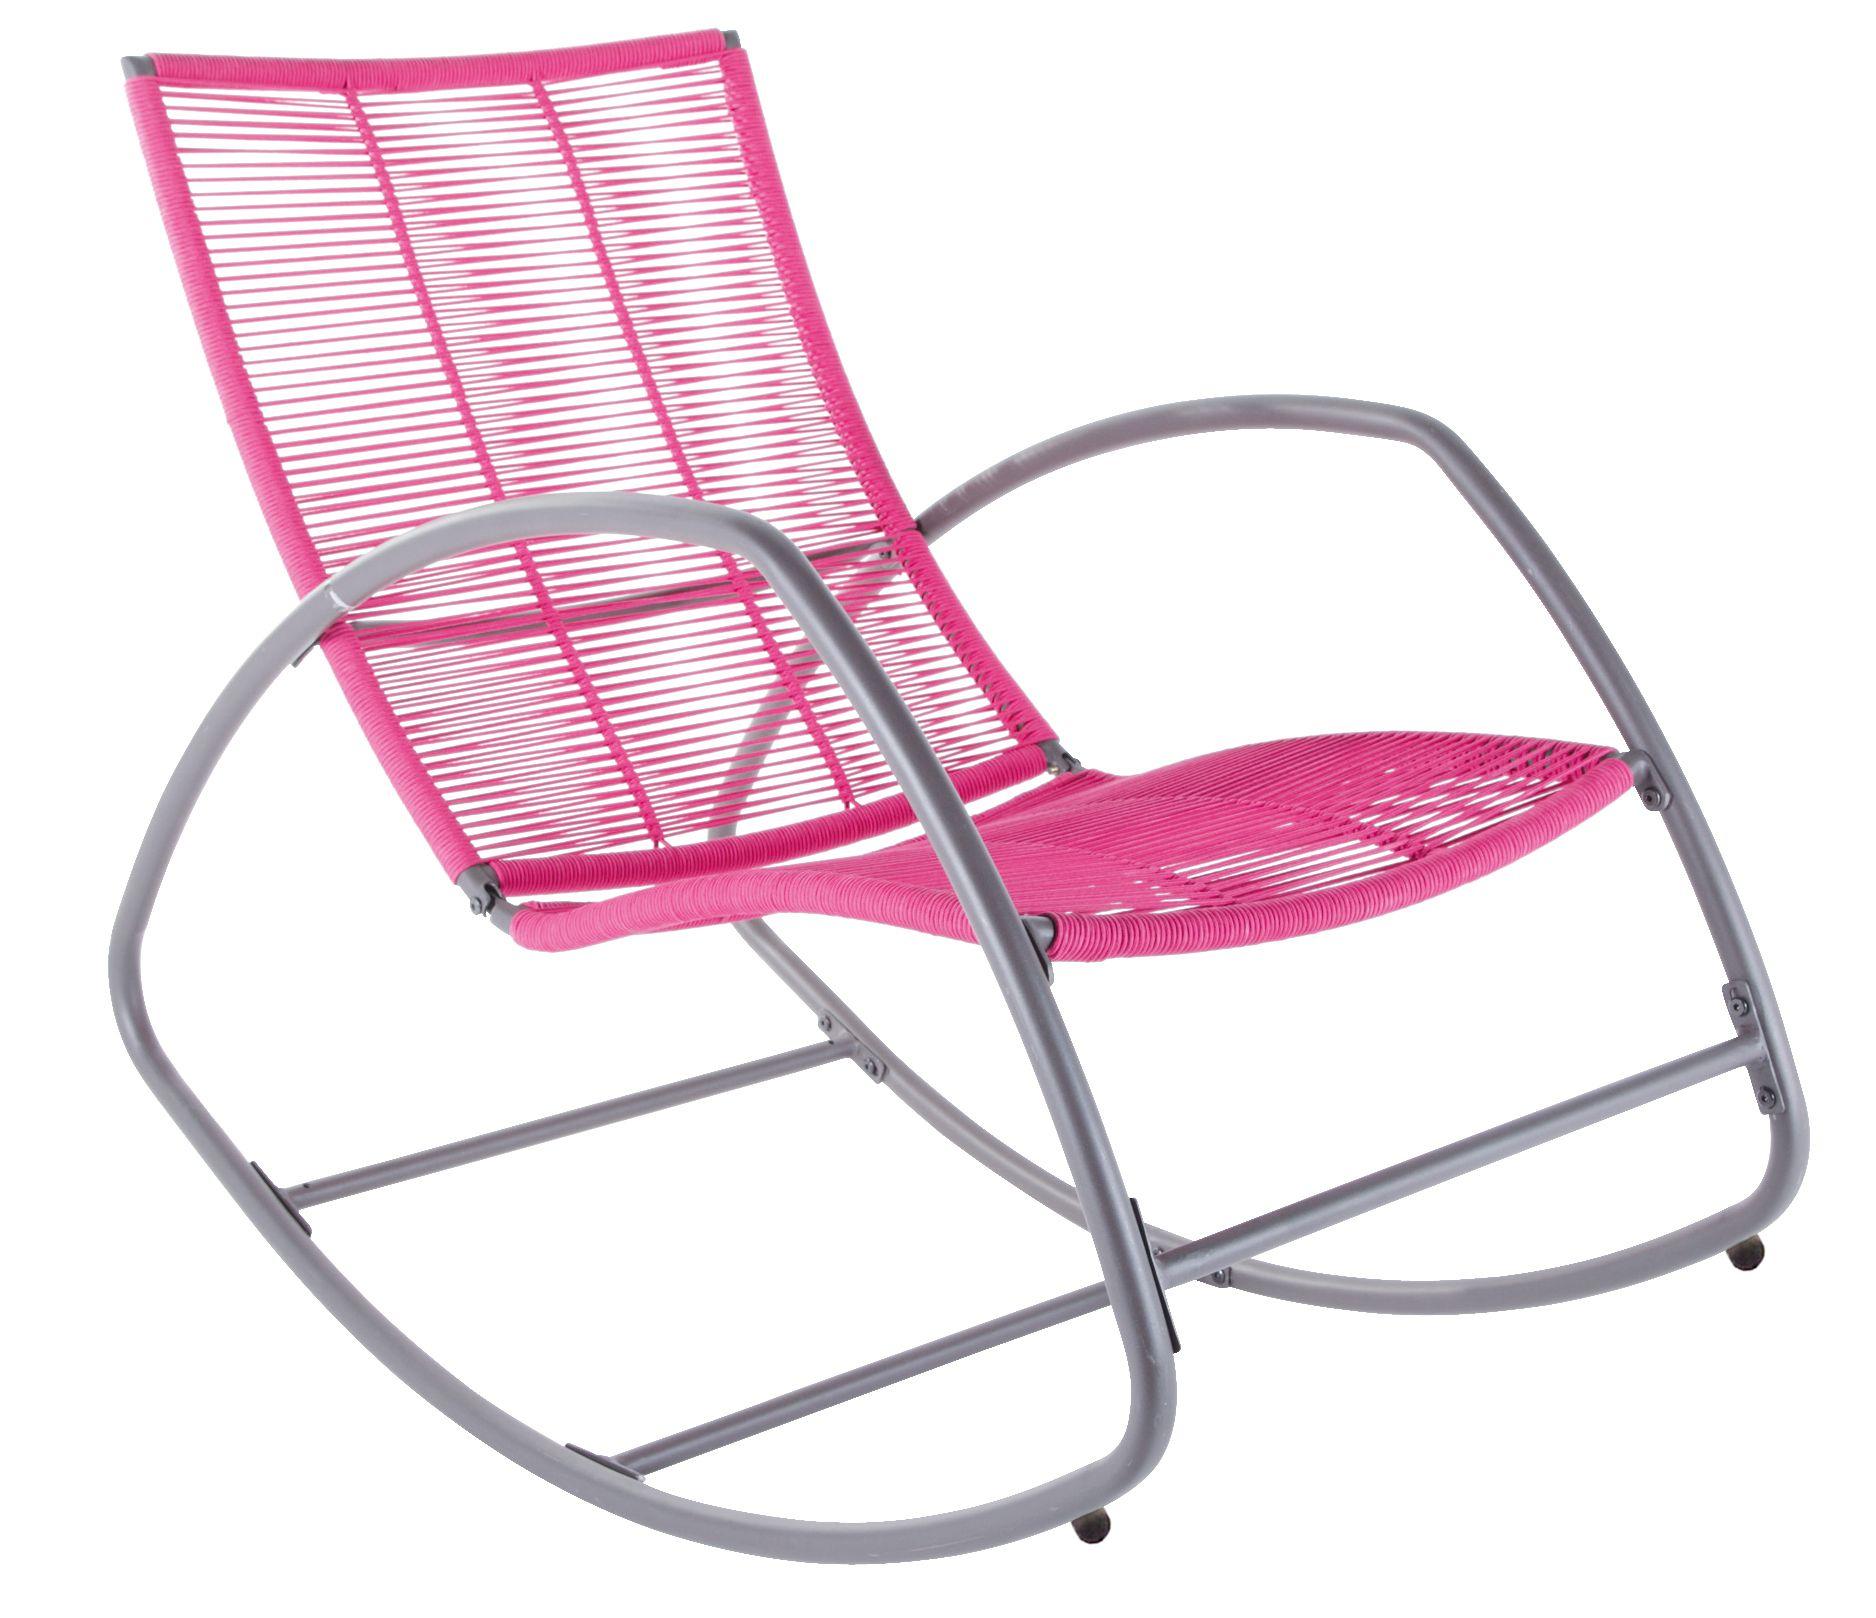 Shower Enclosures For Baths Moretta Rocking Chair Departments Diy At B Amp Q